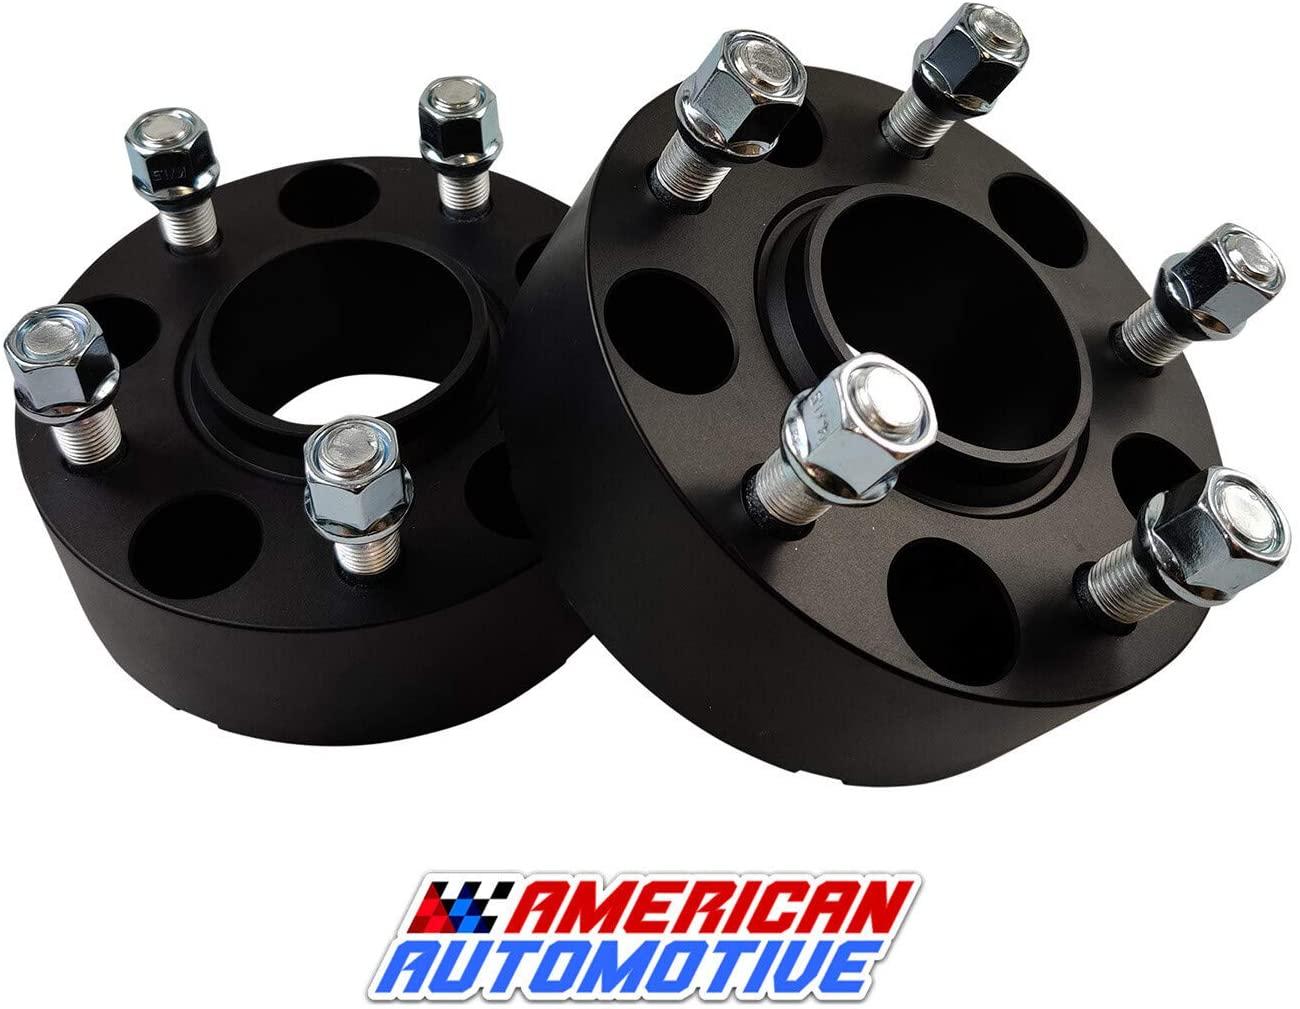 American Automotive 2pc 2 inch 5 x 5